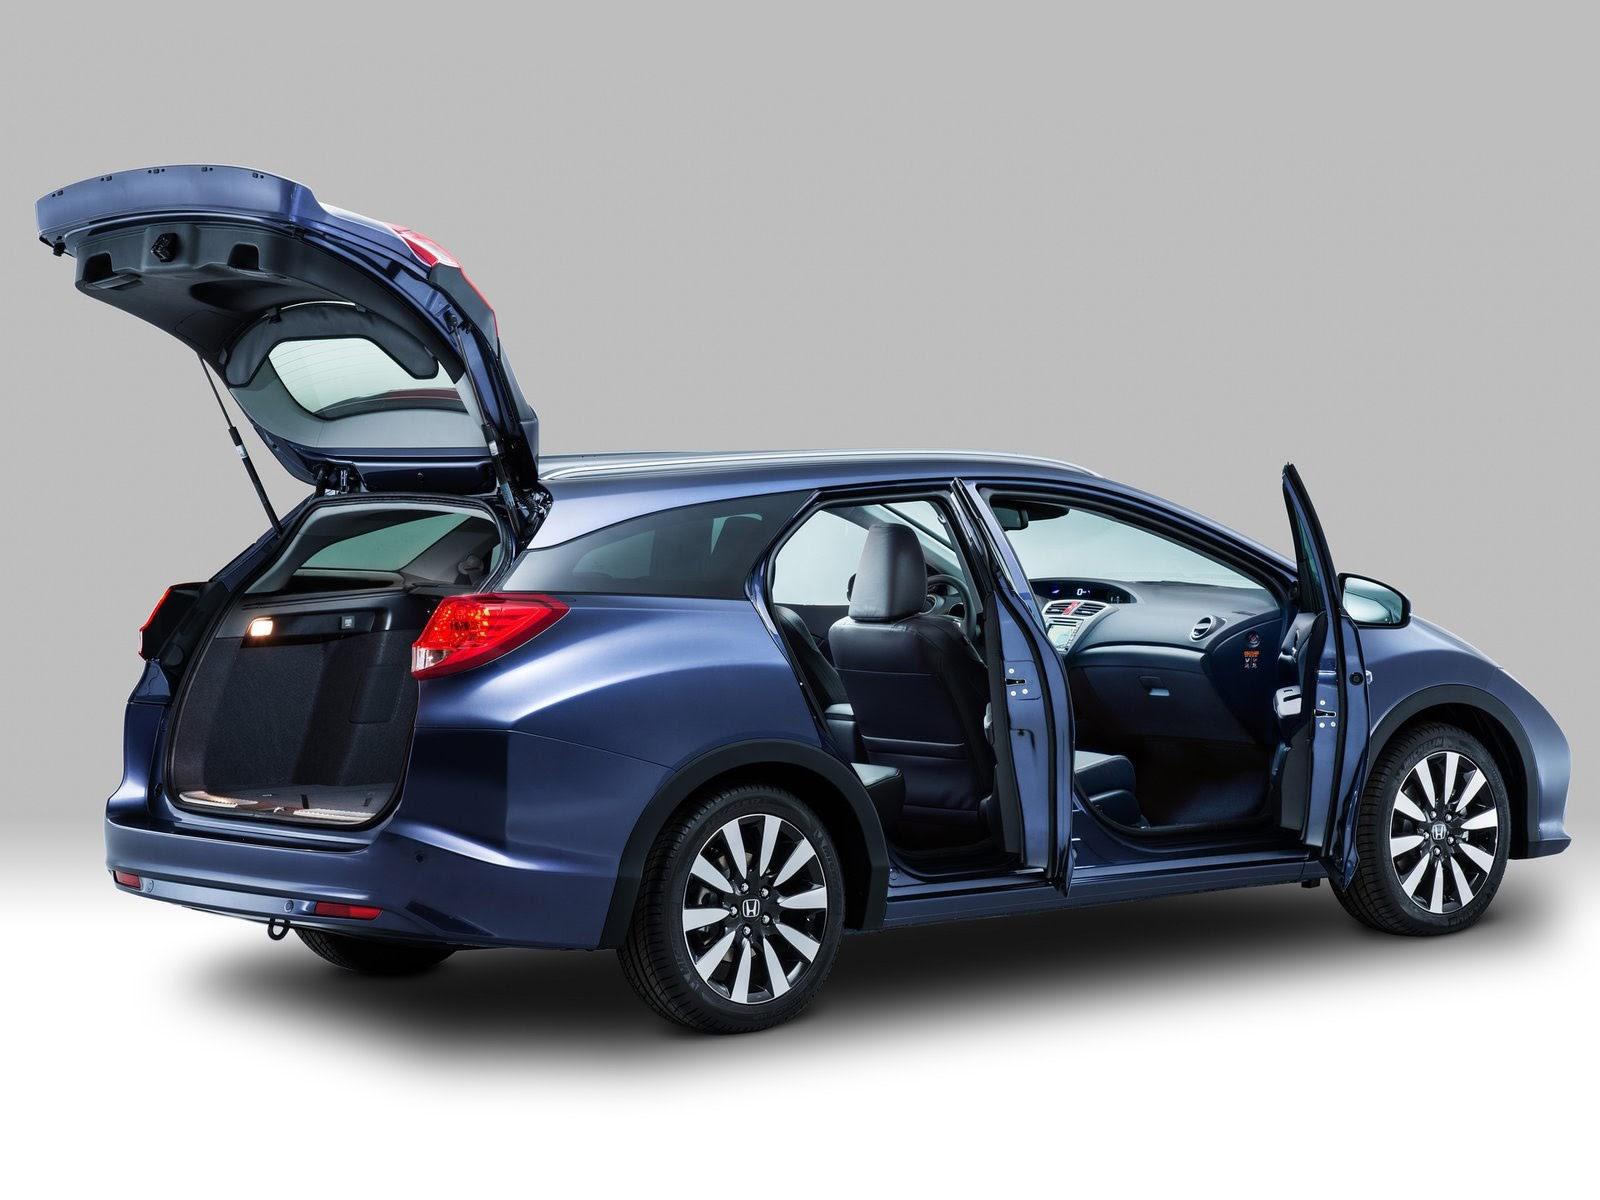 2014 honda civic tourer car accident lawyers insurance. Black Bedroom Furniture Sets. Home Design Ideas